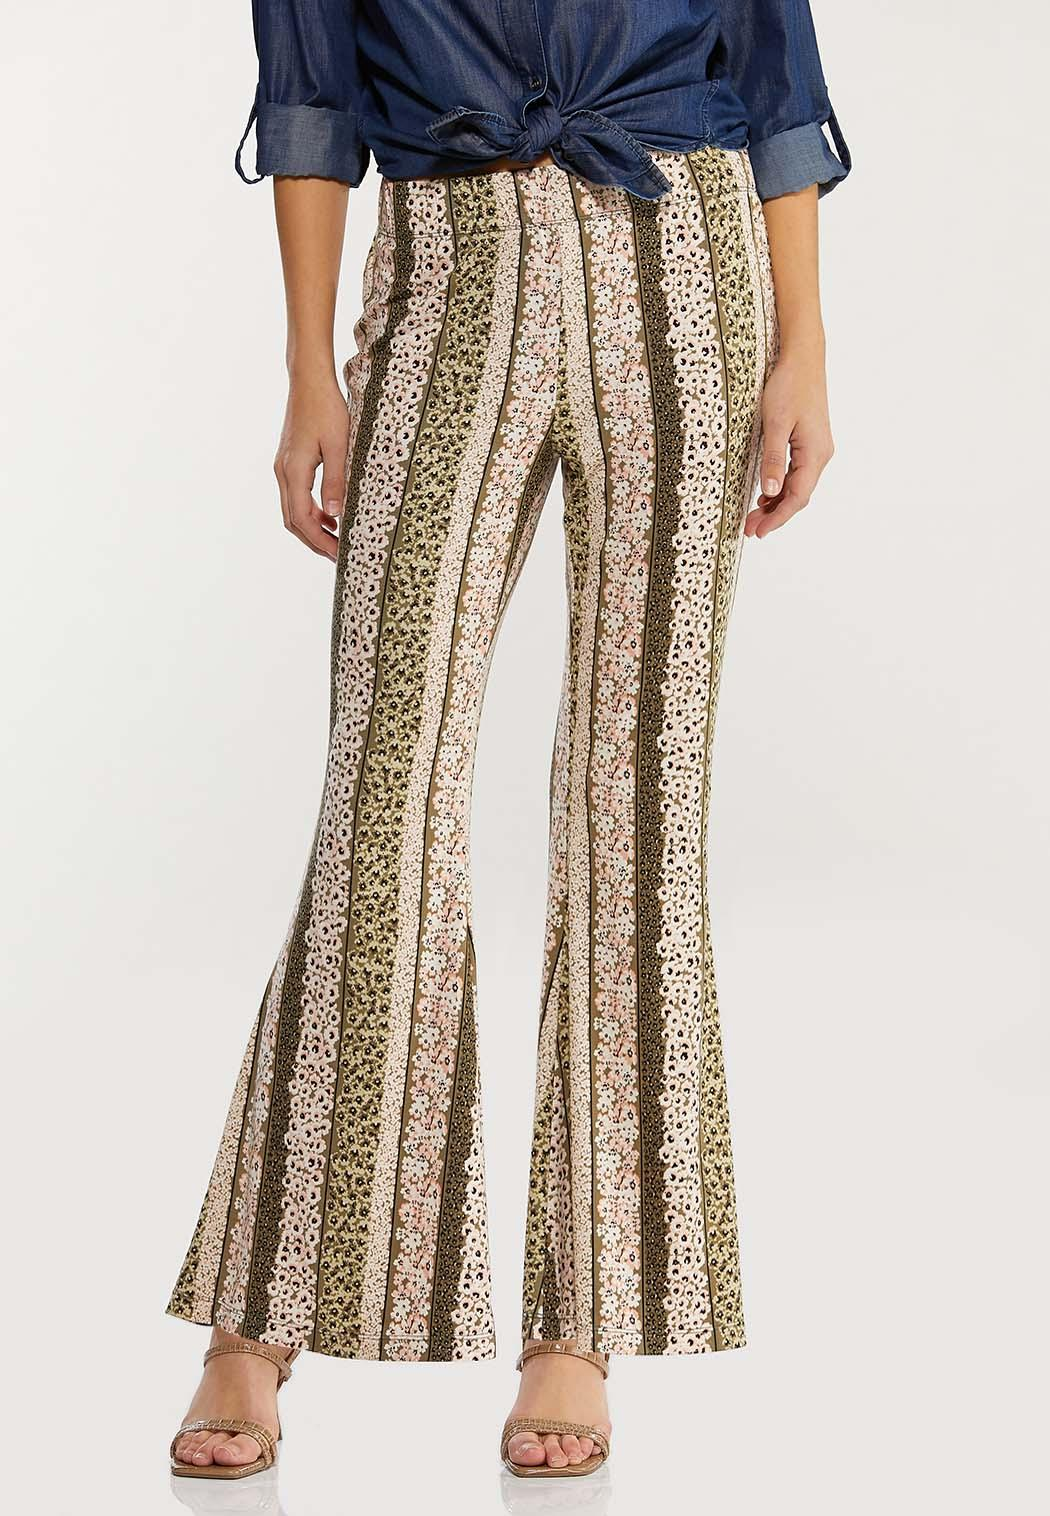 Petite Stripe Floral Flare Pants